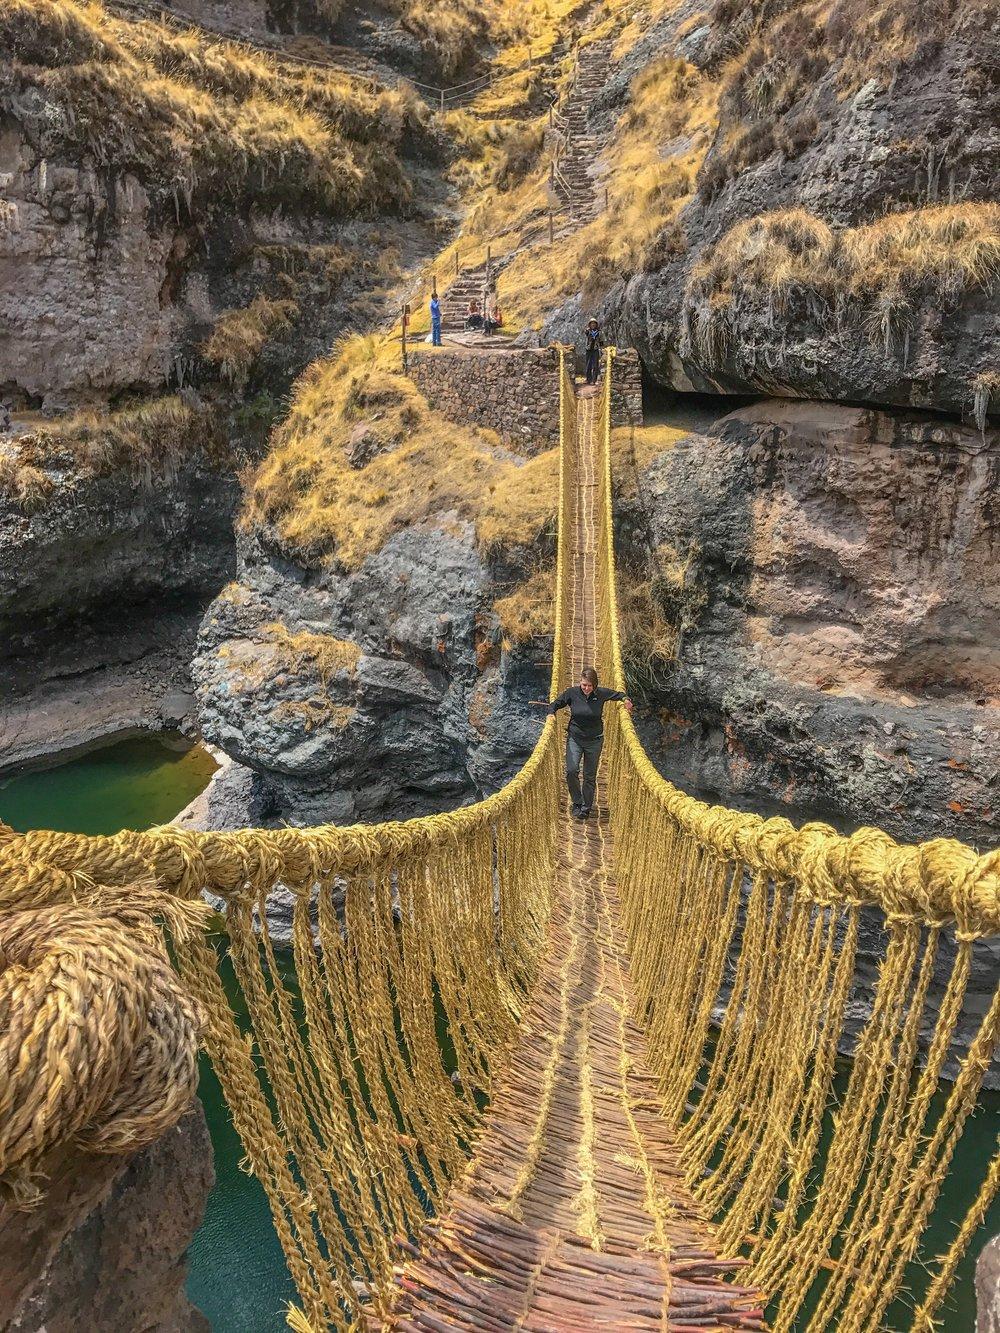 Crossing the last Inca reed bridge in Peru